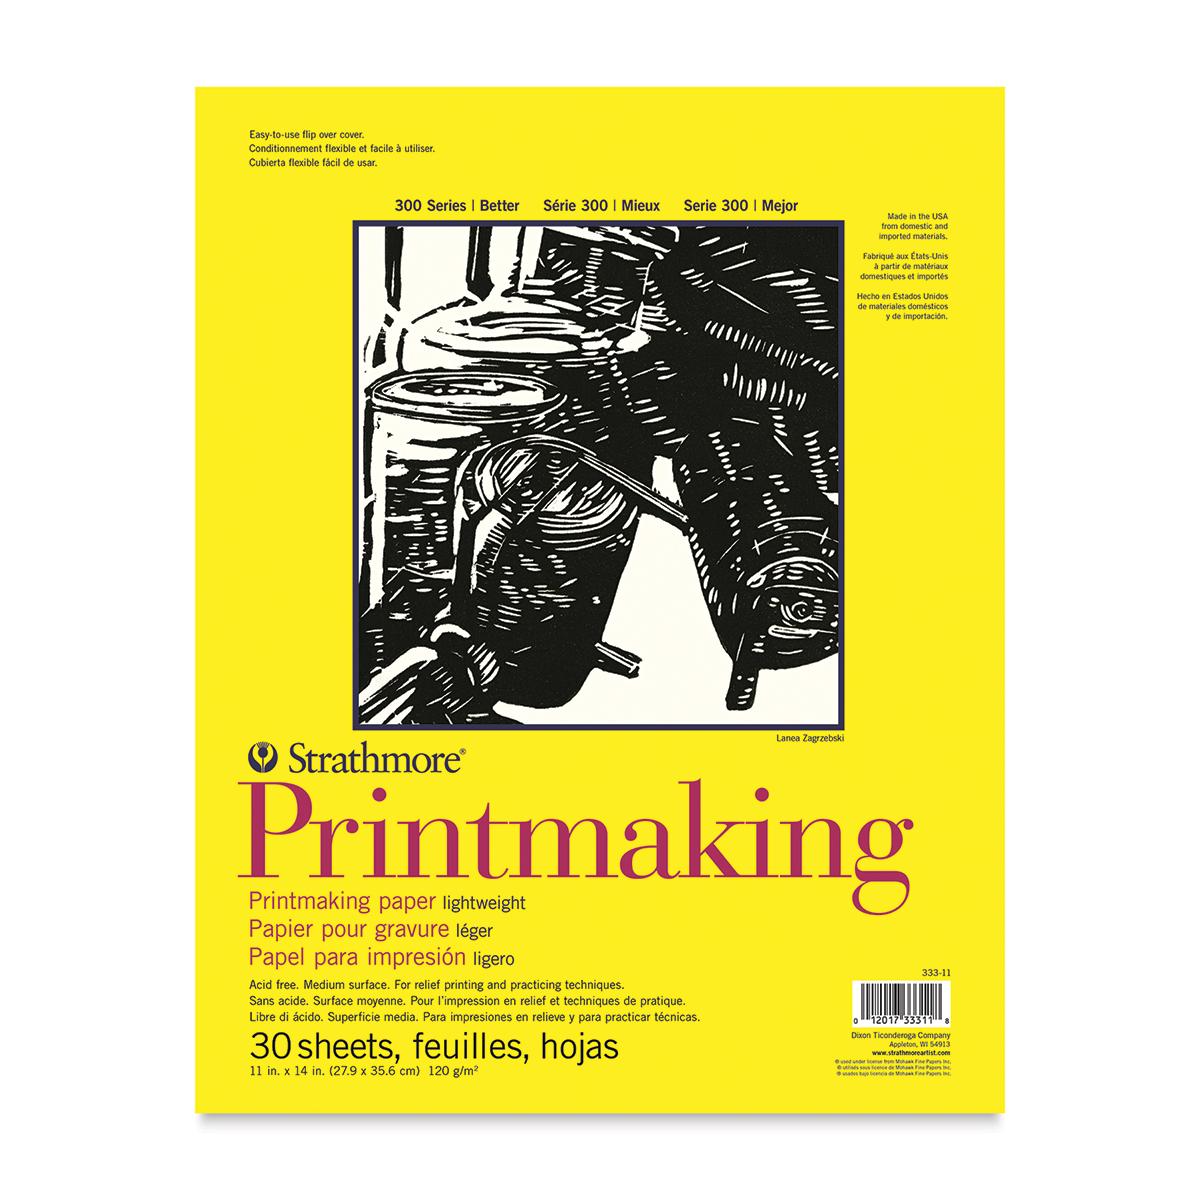 Strathmore 300 Series Printmaking Paper - 11 x 14, 30 Sheets